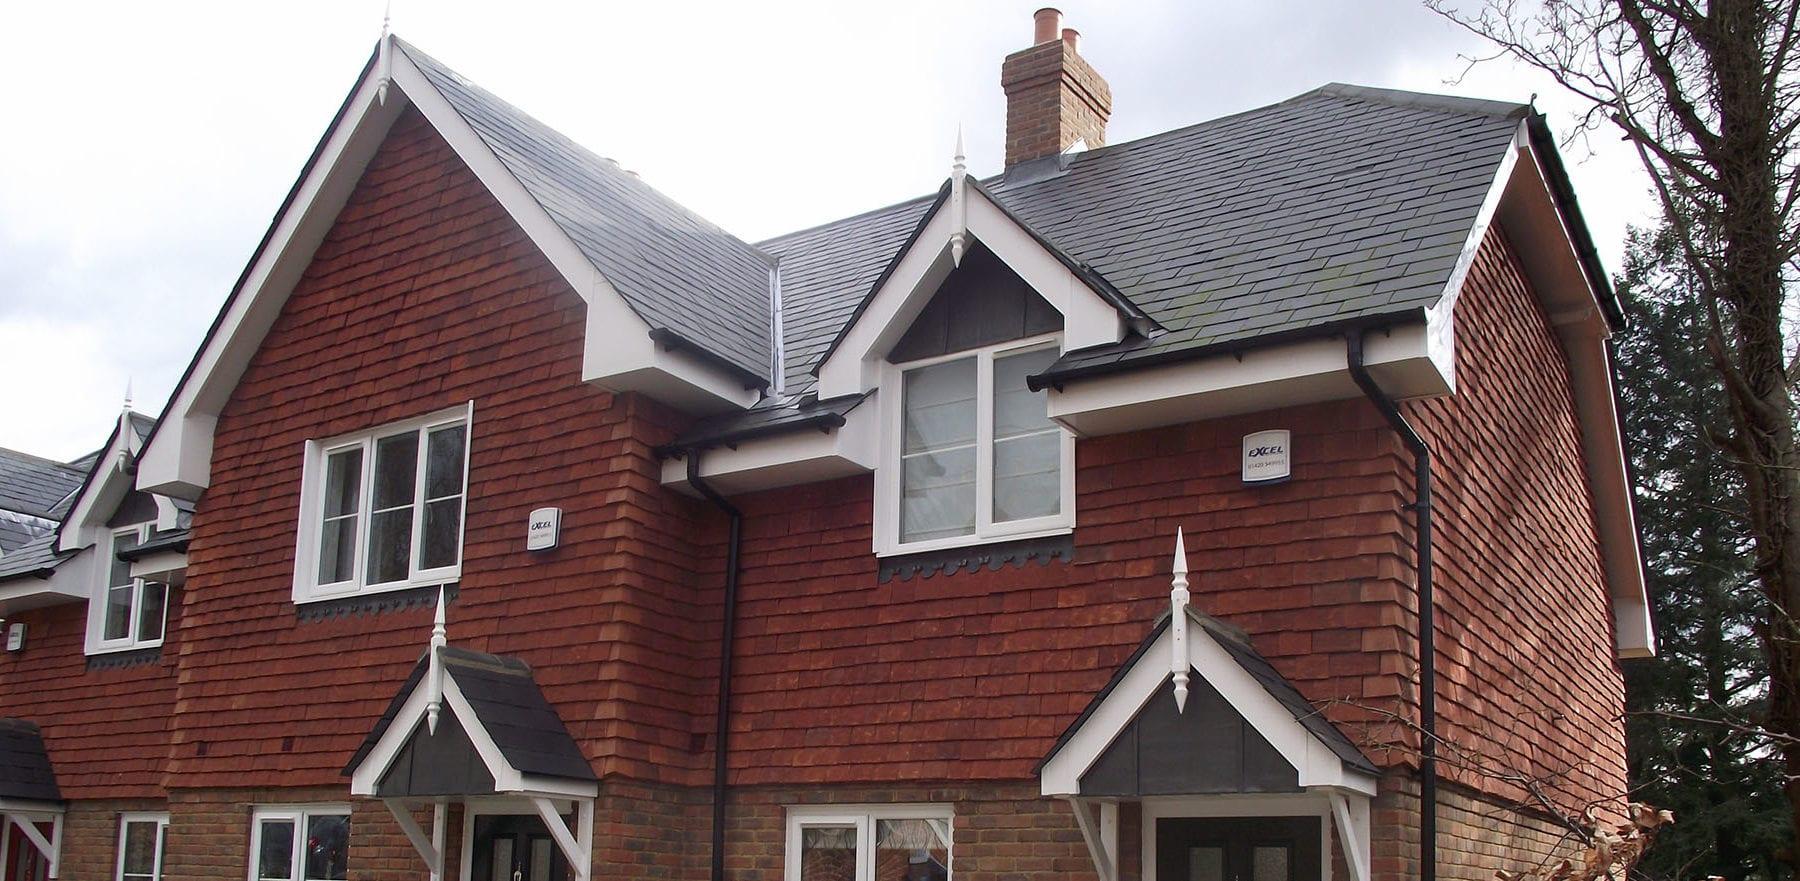 Lifestiles - Handmade Red Clay Roof Tiles - Frensham, England